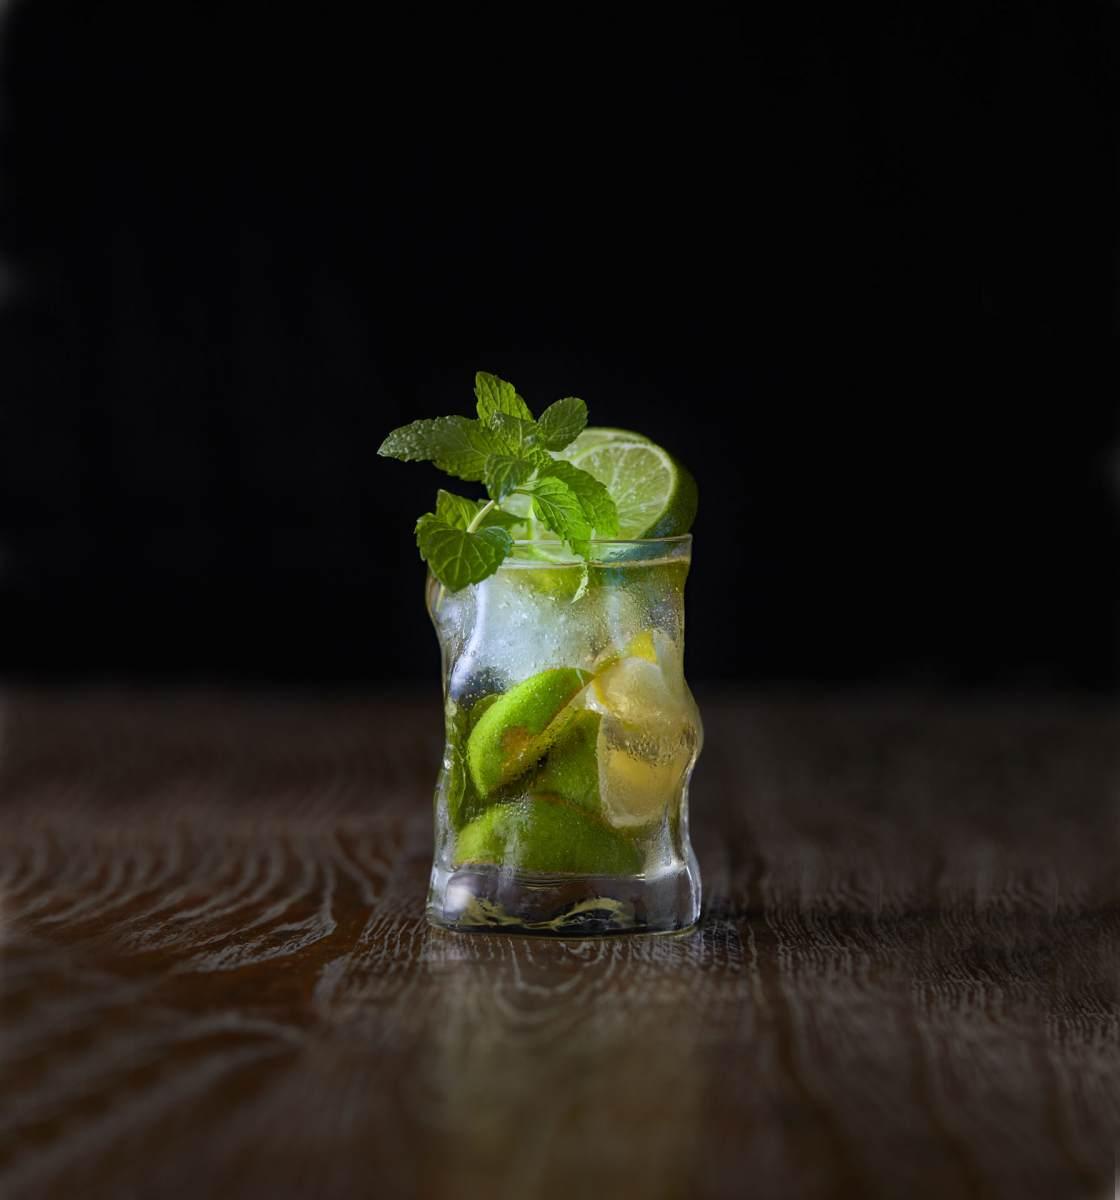 Food-Photography-Singapore-Marche-Cocktails-1